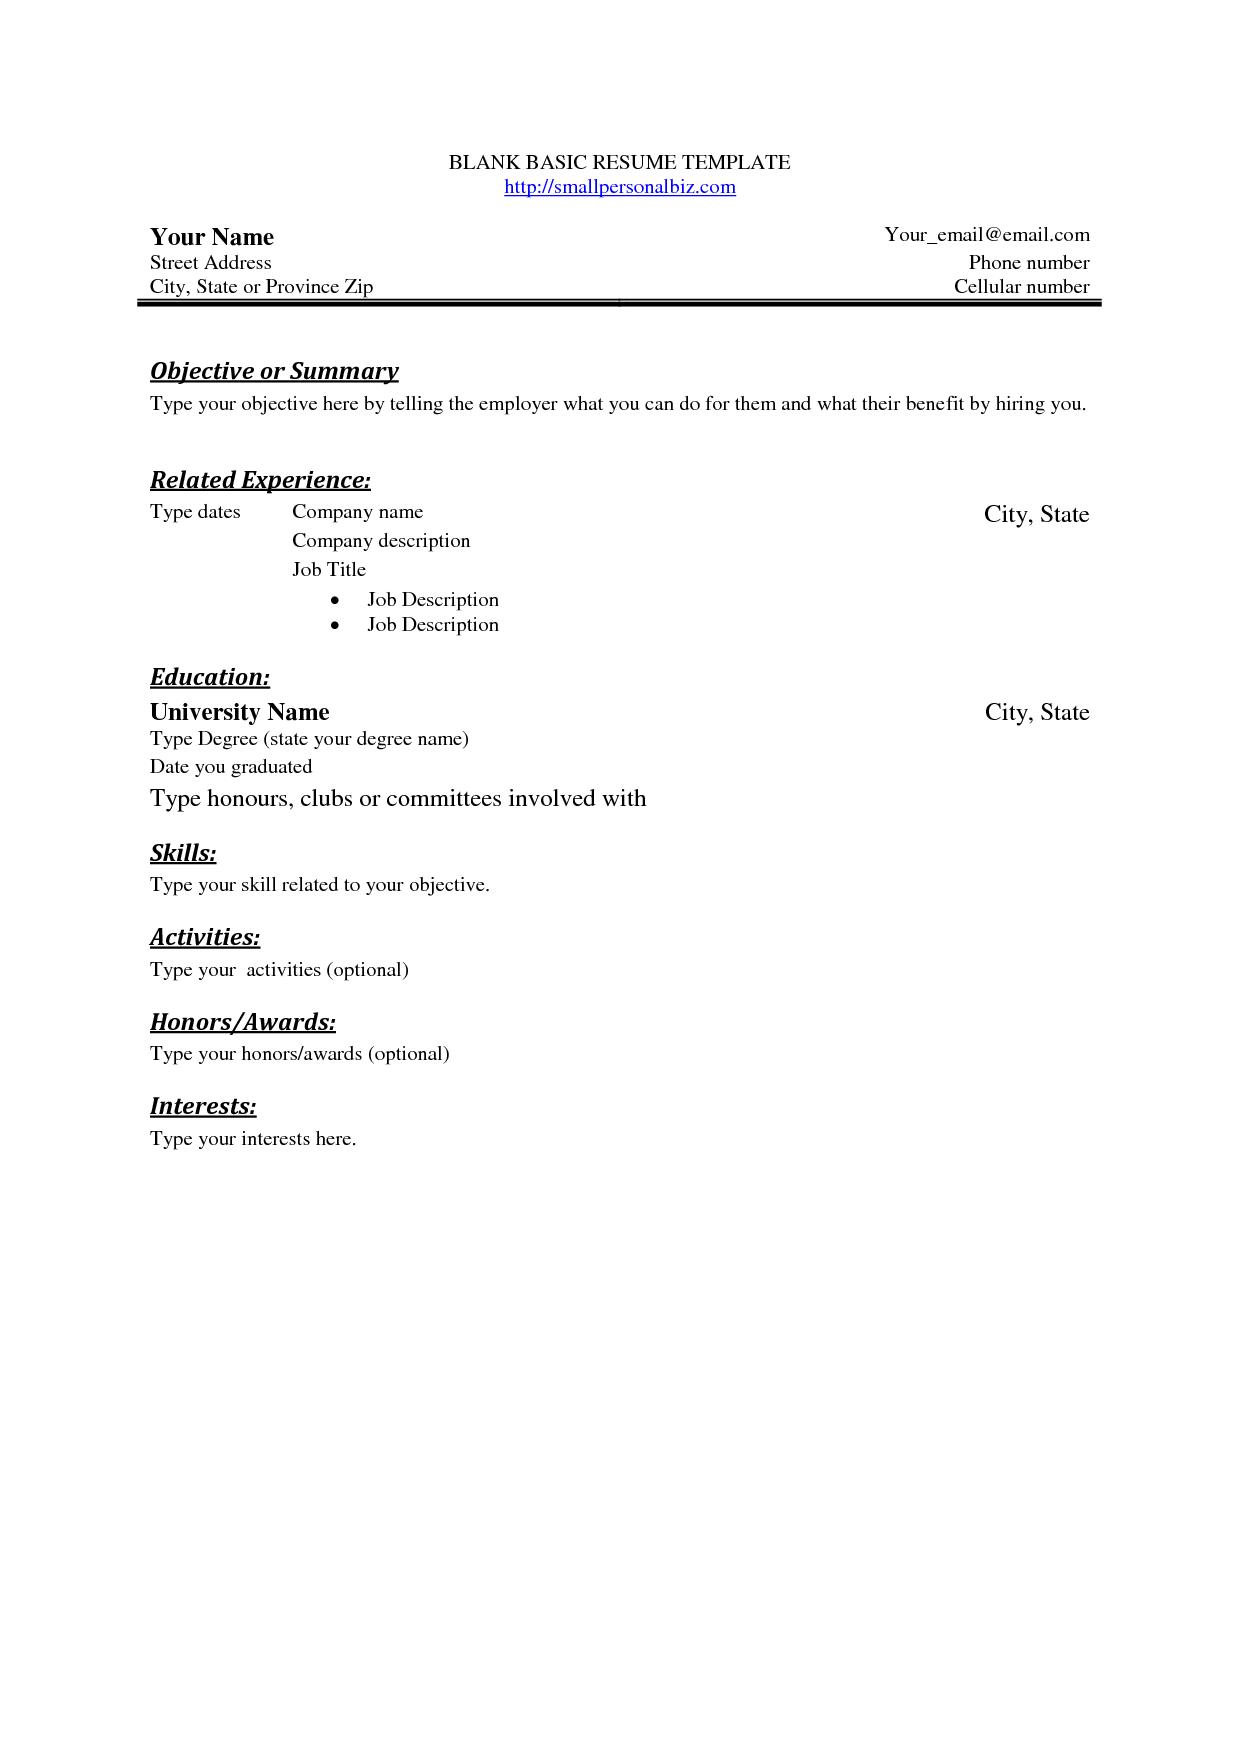 Free Basic Blank Resume Template | Free Basic Sample Resume | Beauty - Free Printable Professional Resume Templates